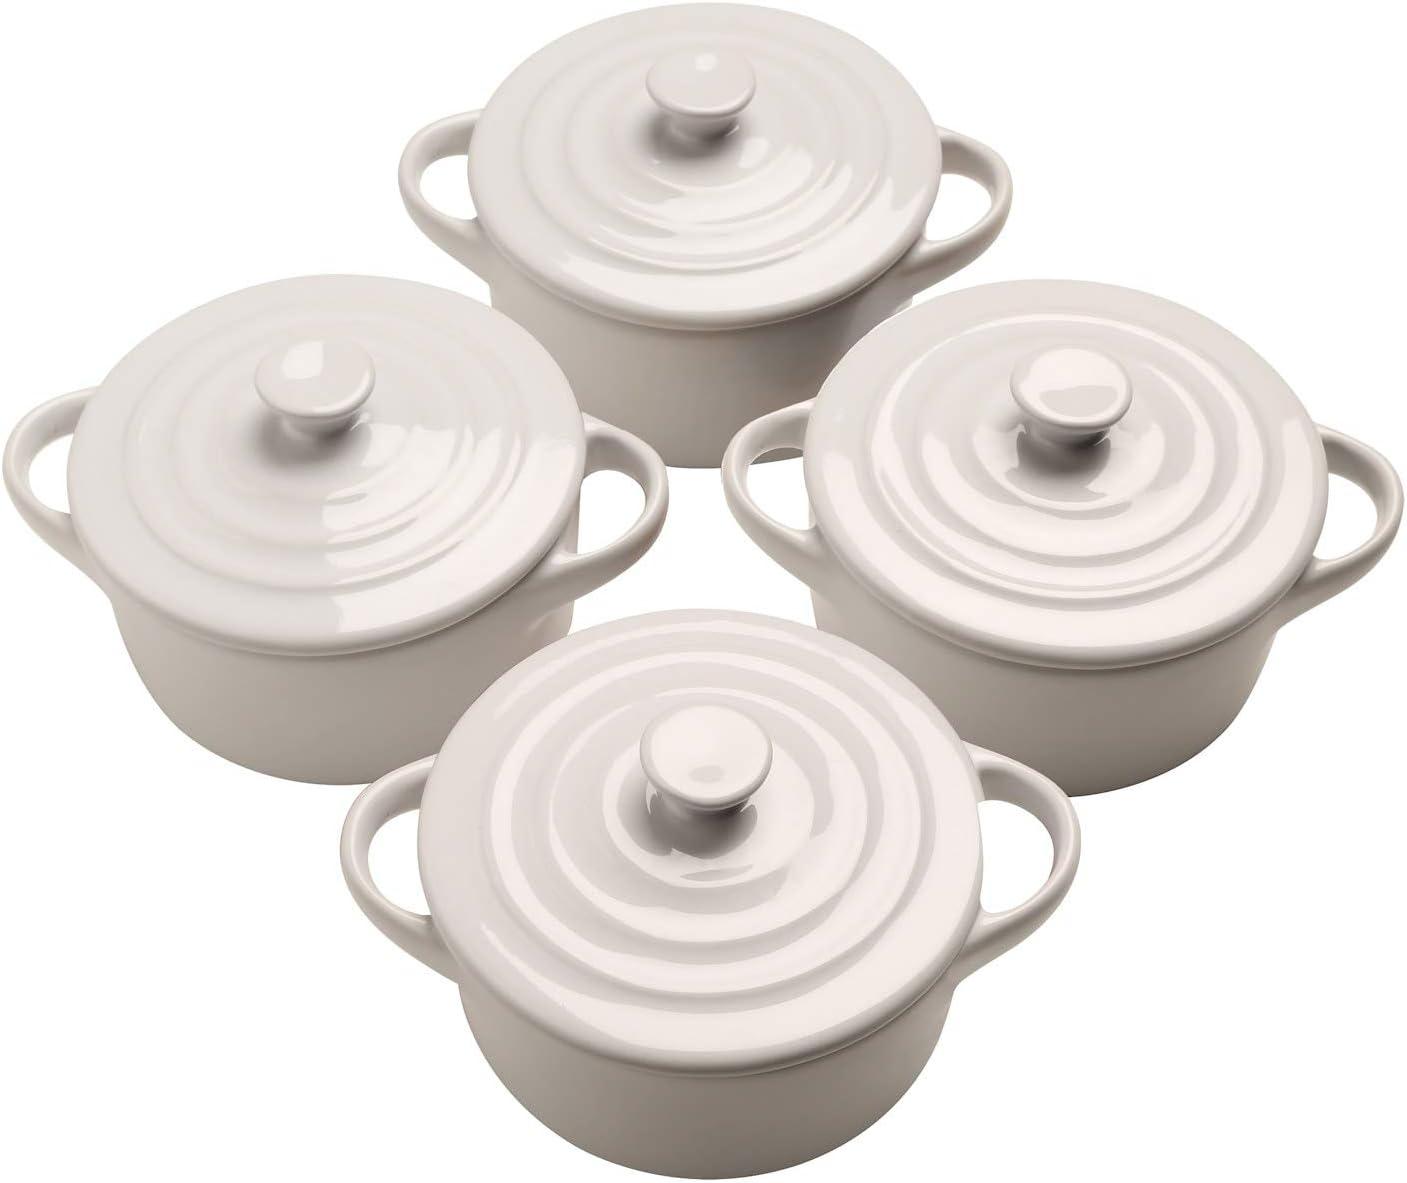 Home District Mini Casserole Pots - Set of 4 White Lidded Stoneware Dishes, Soup Crocks Oven Safe, Holds 8 Oz. Each